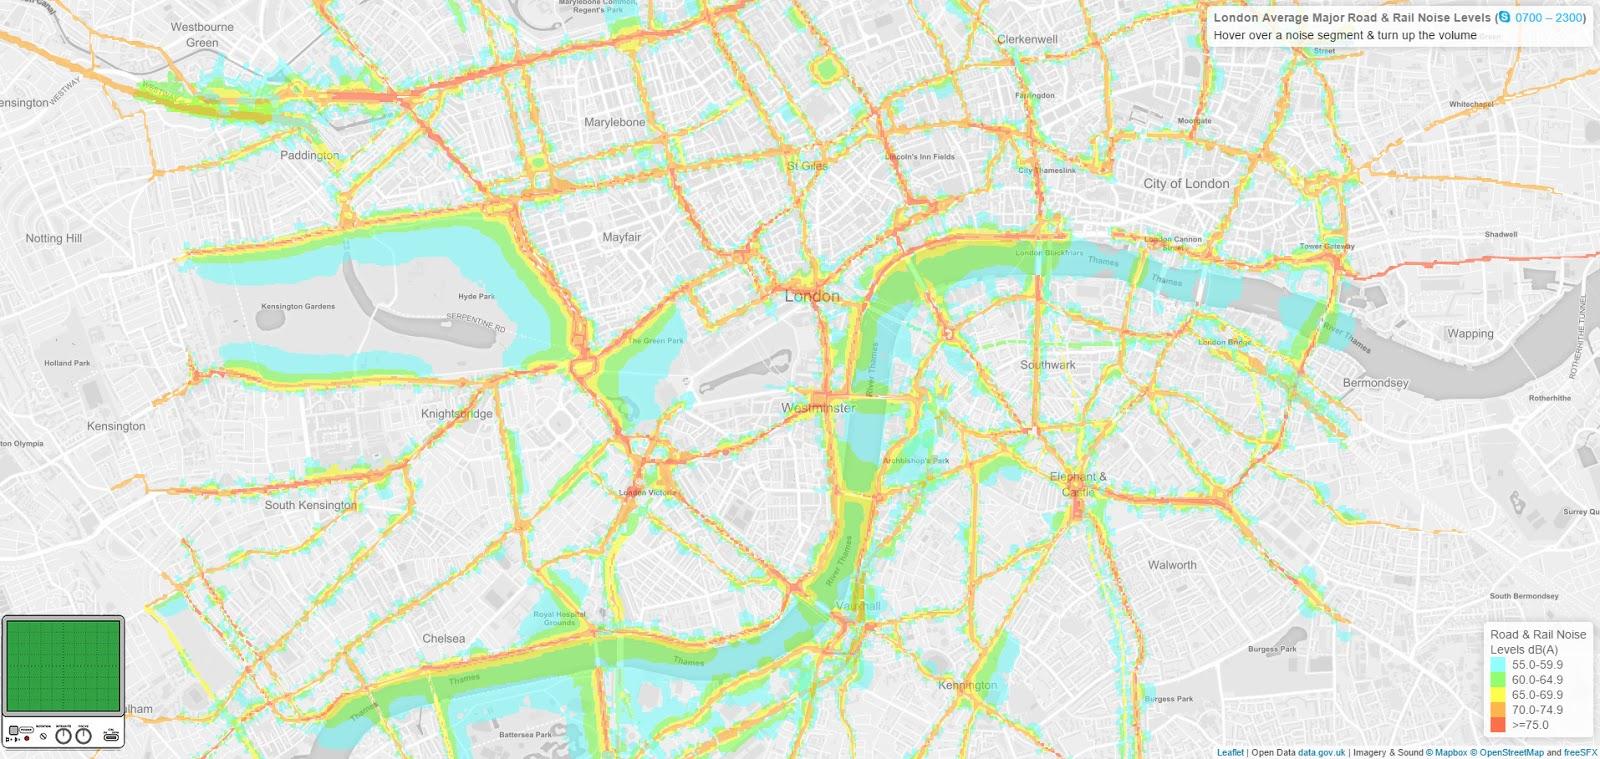 London average major road and rail noise levels